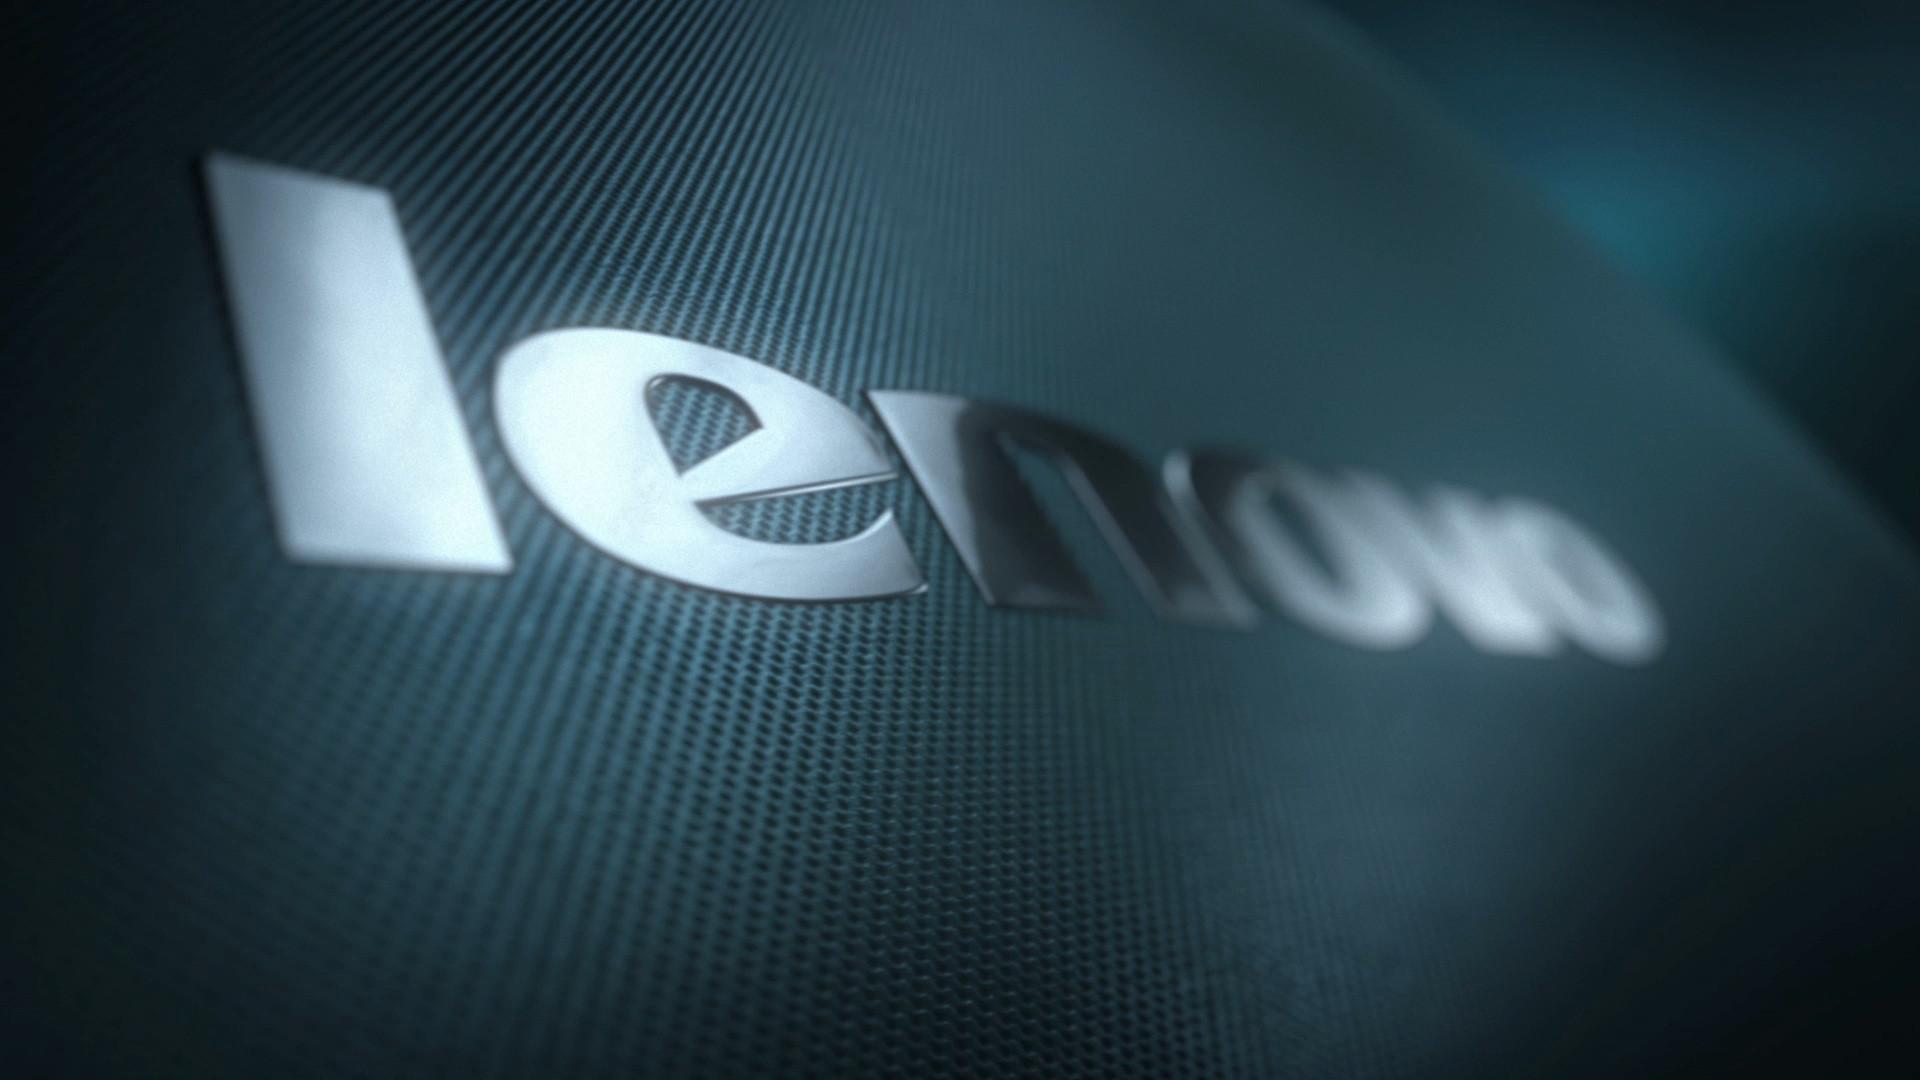 Lenovo Hd Wallpaper: IBM Thinkpad Wallpaper (68+ Images